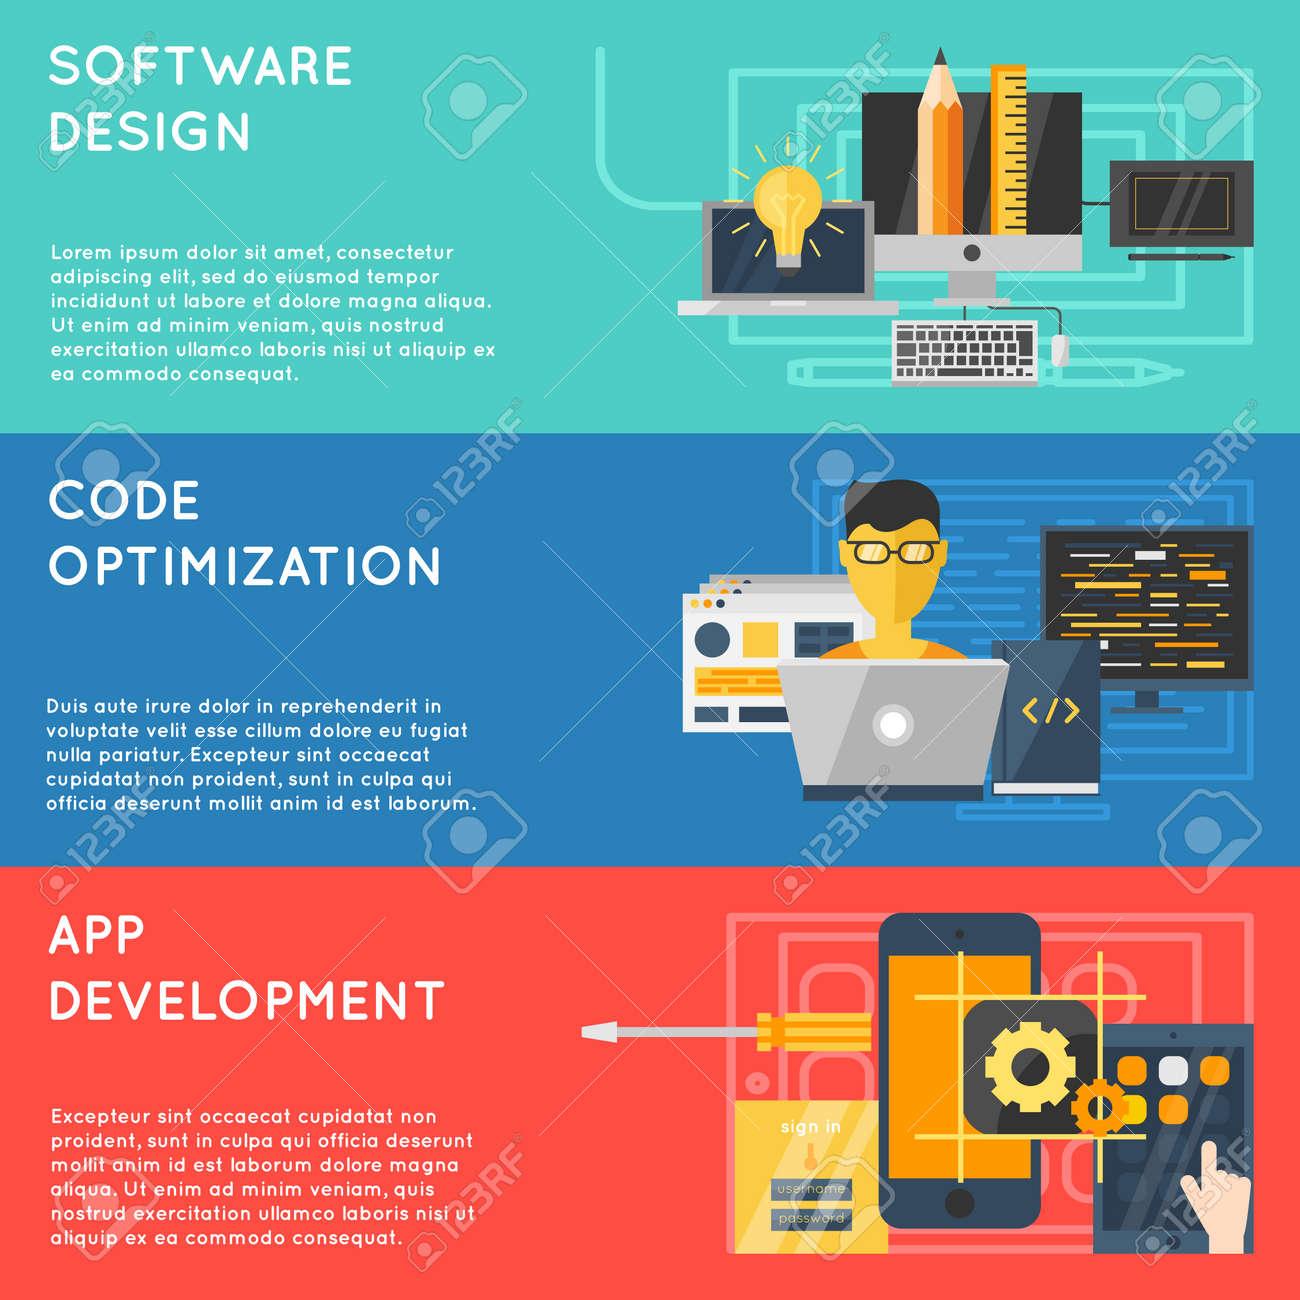 Horizontal program development banner set with descriptions of software design code optimization app development vector illustration - 166687585